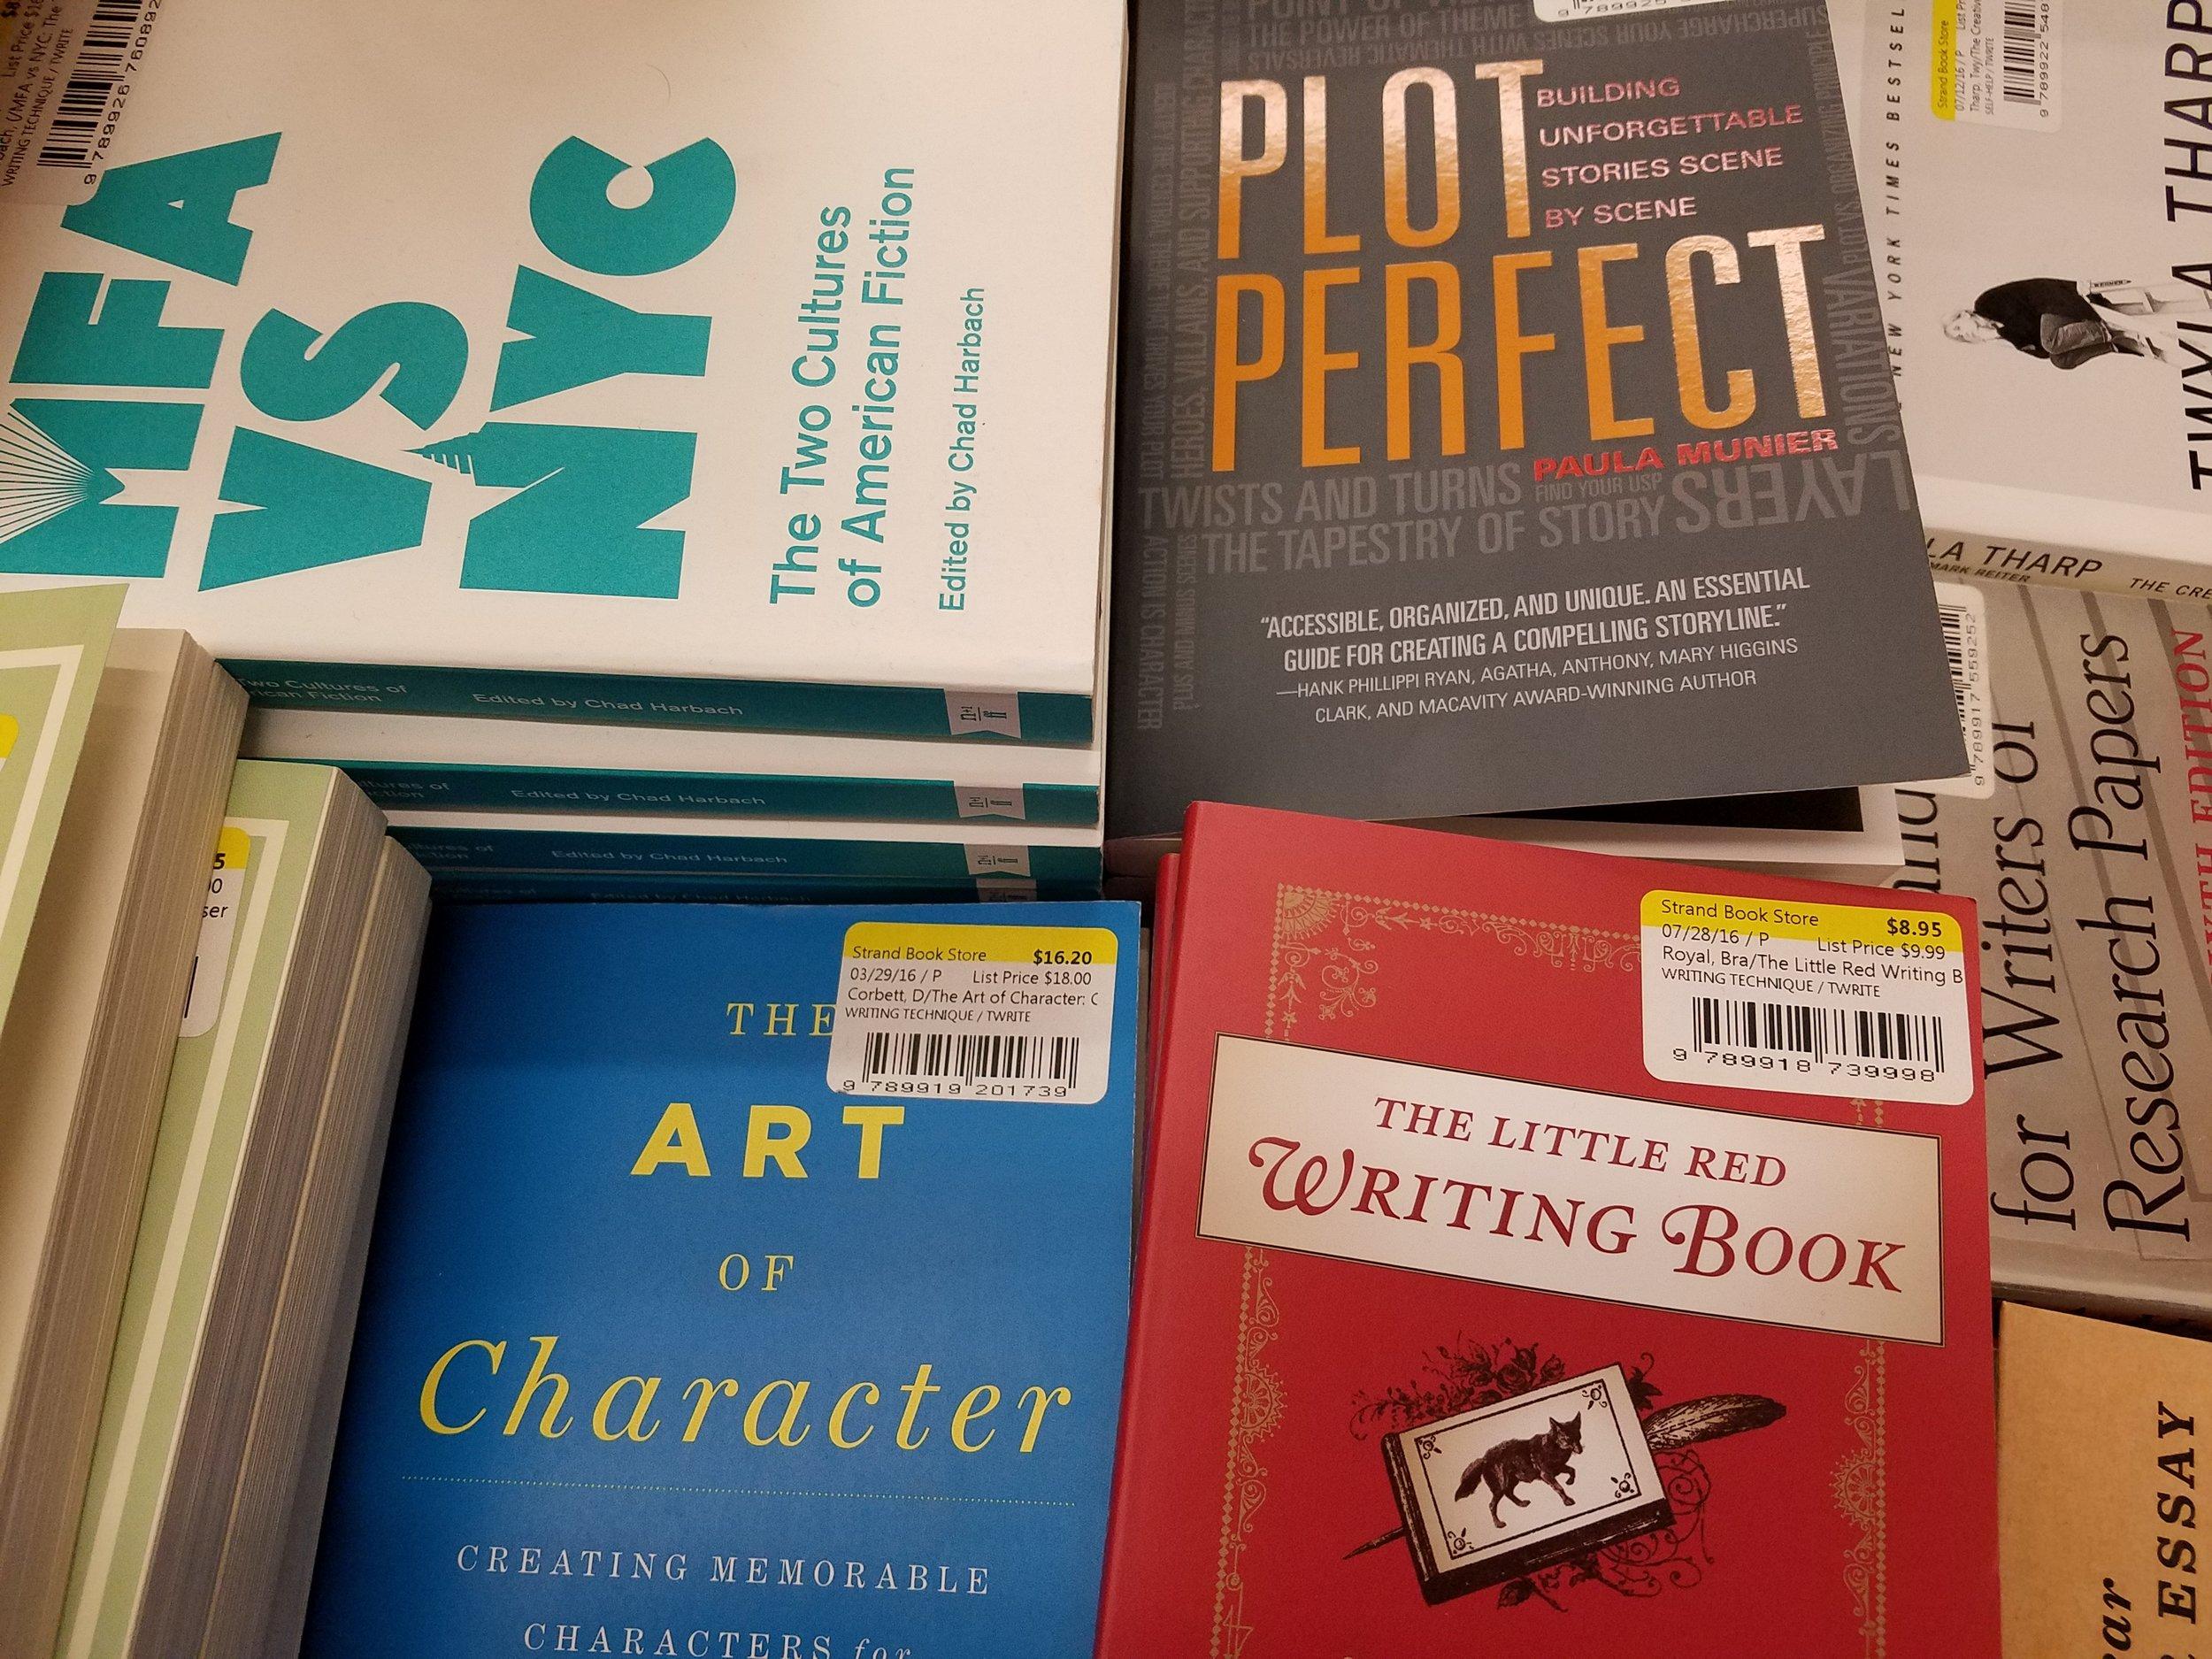 Stack of books at the Strand Bookstore in Union Square, Manhattan.